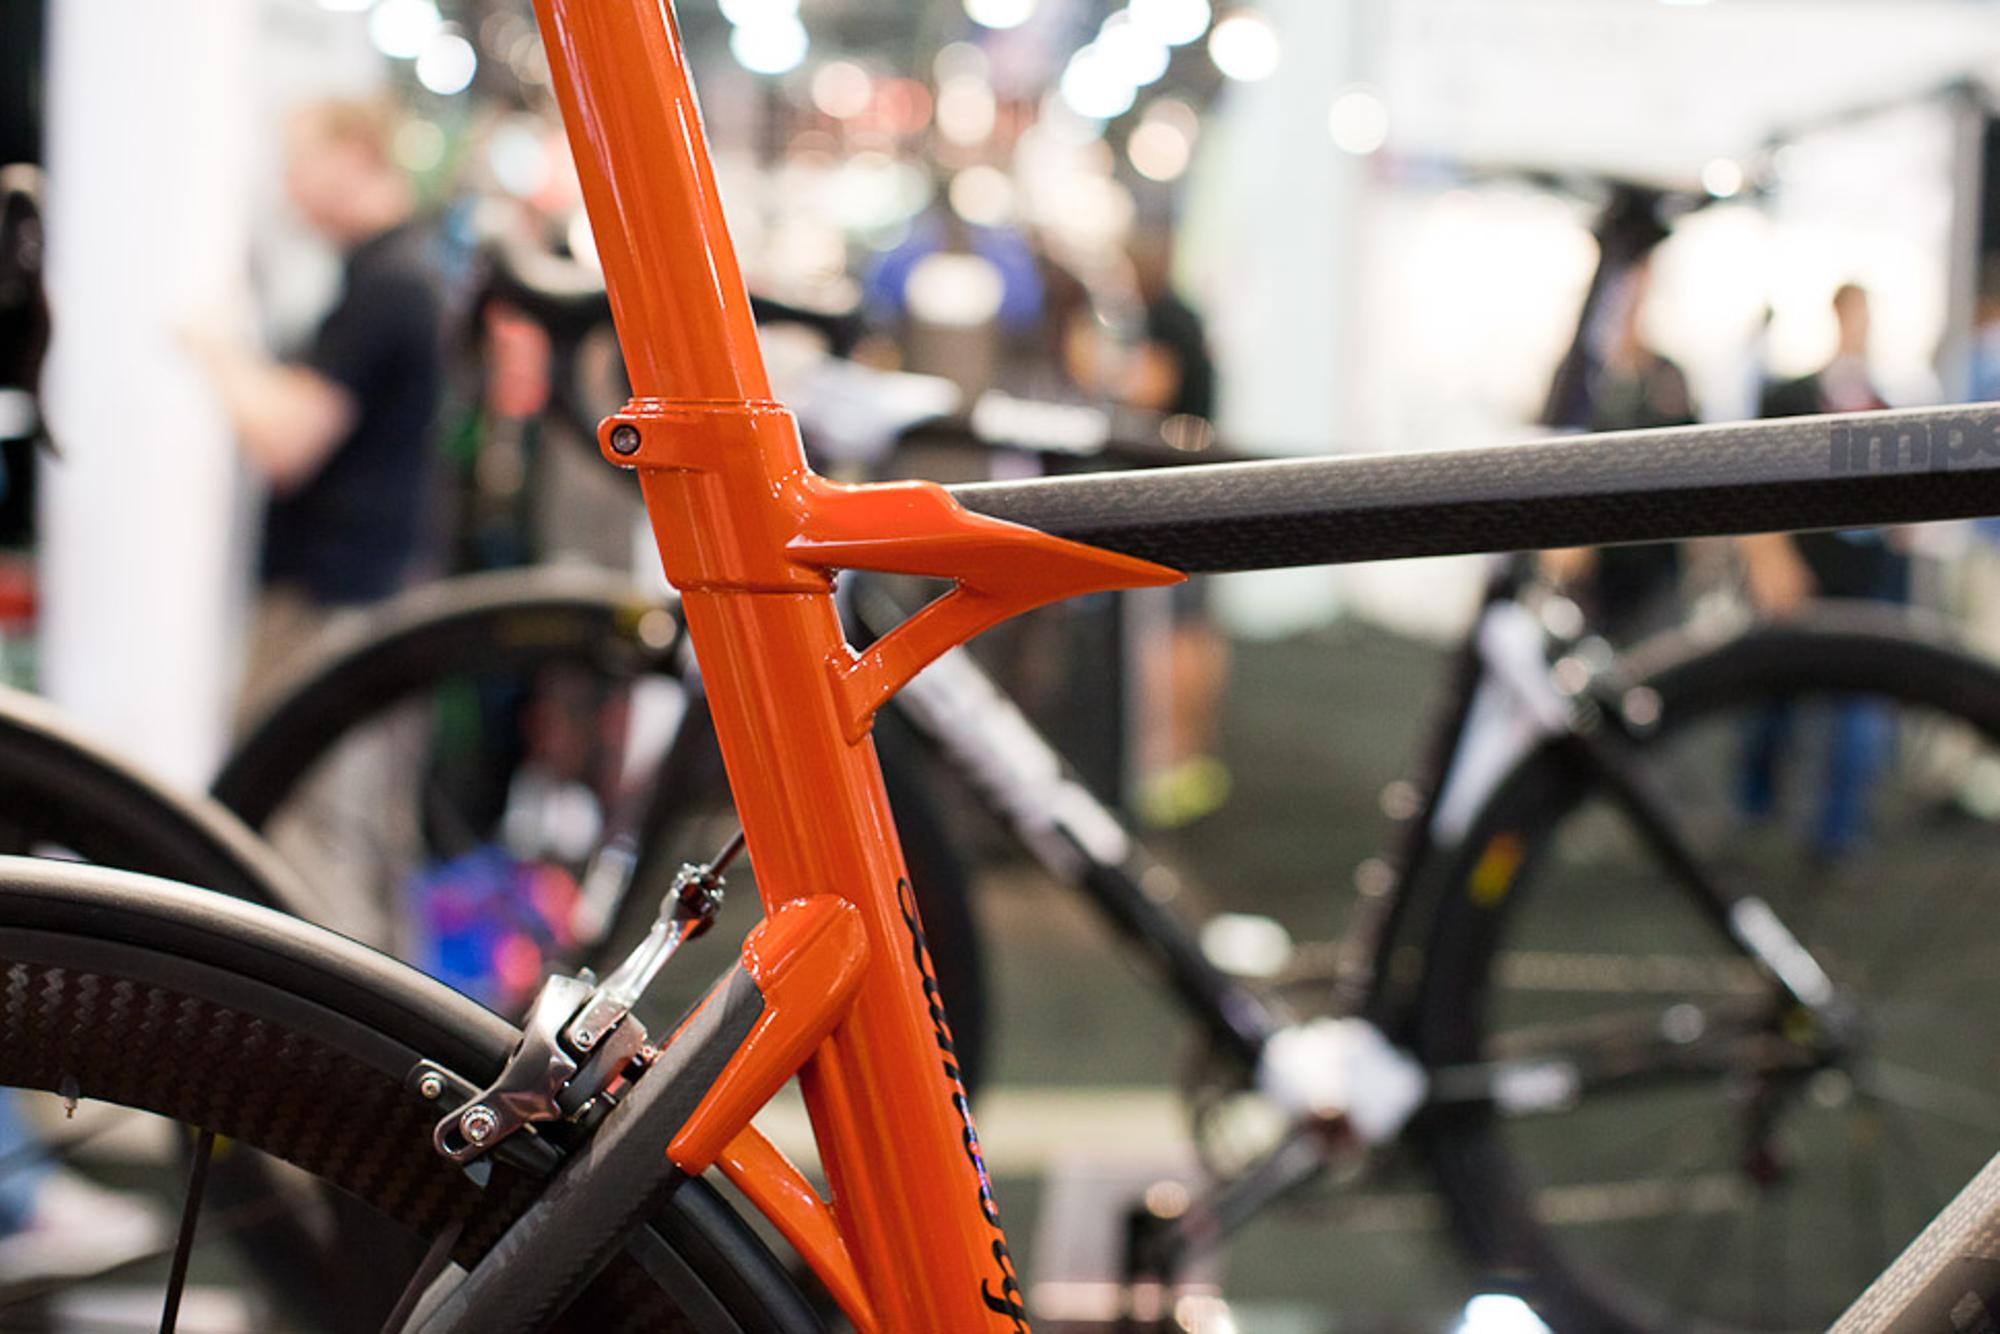 Interbike 2012: BMC